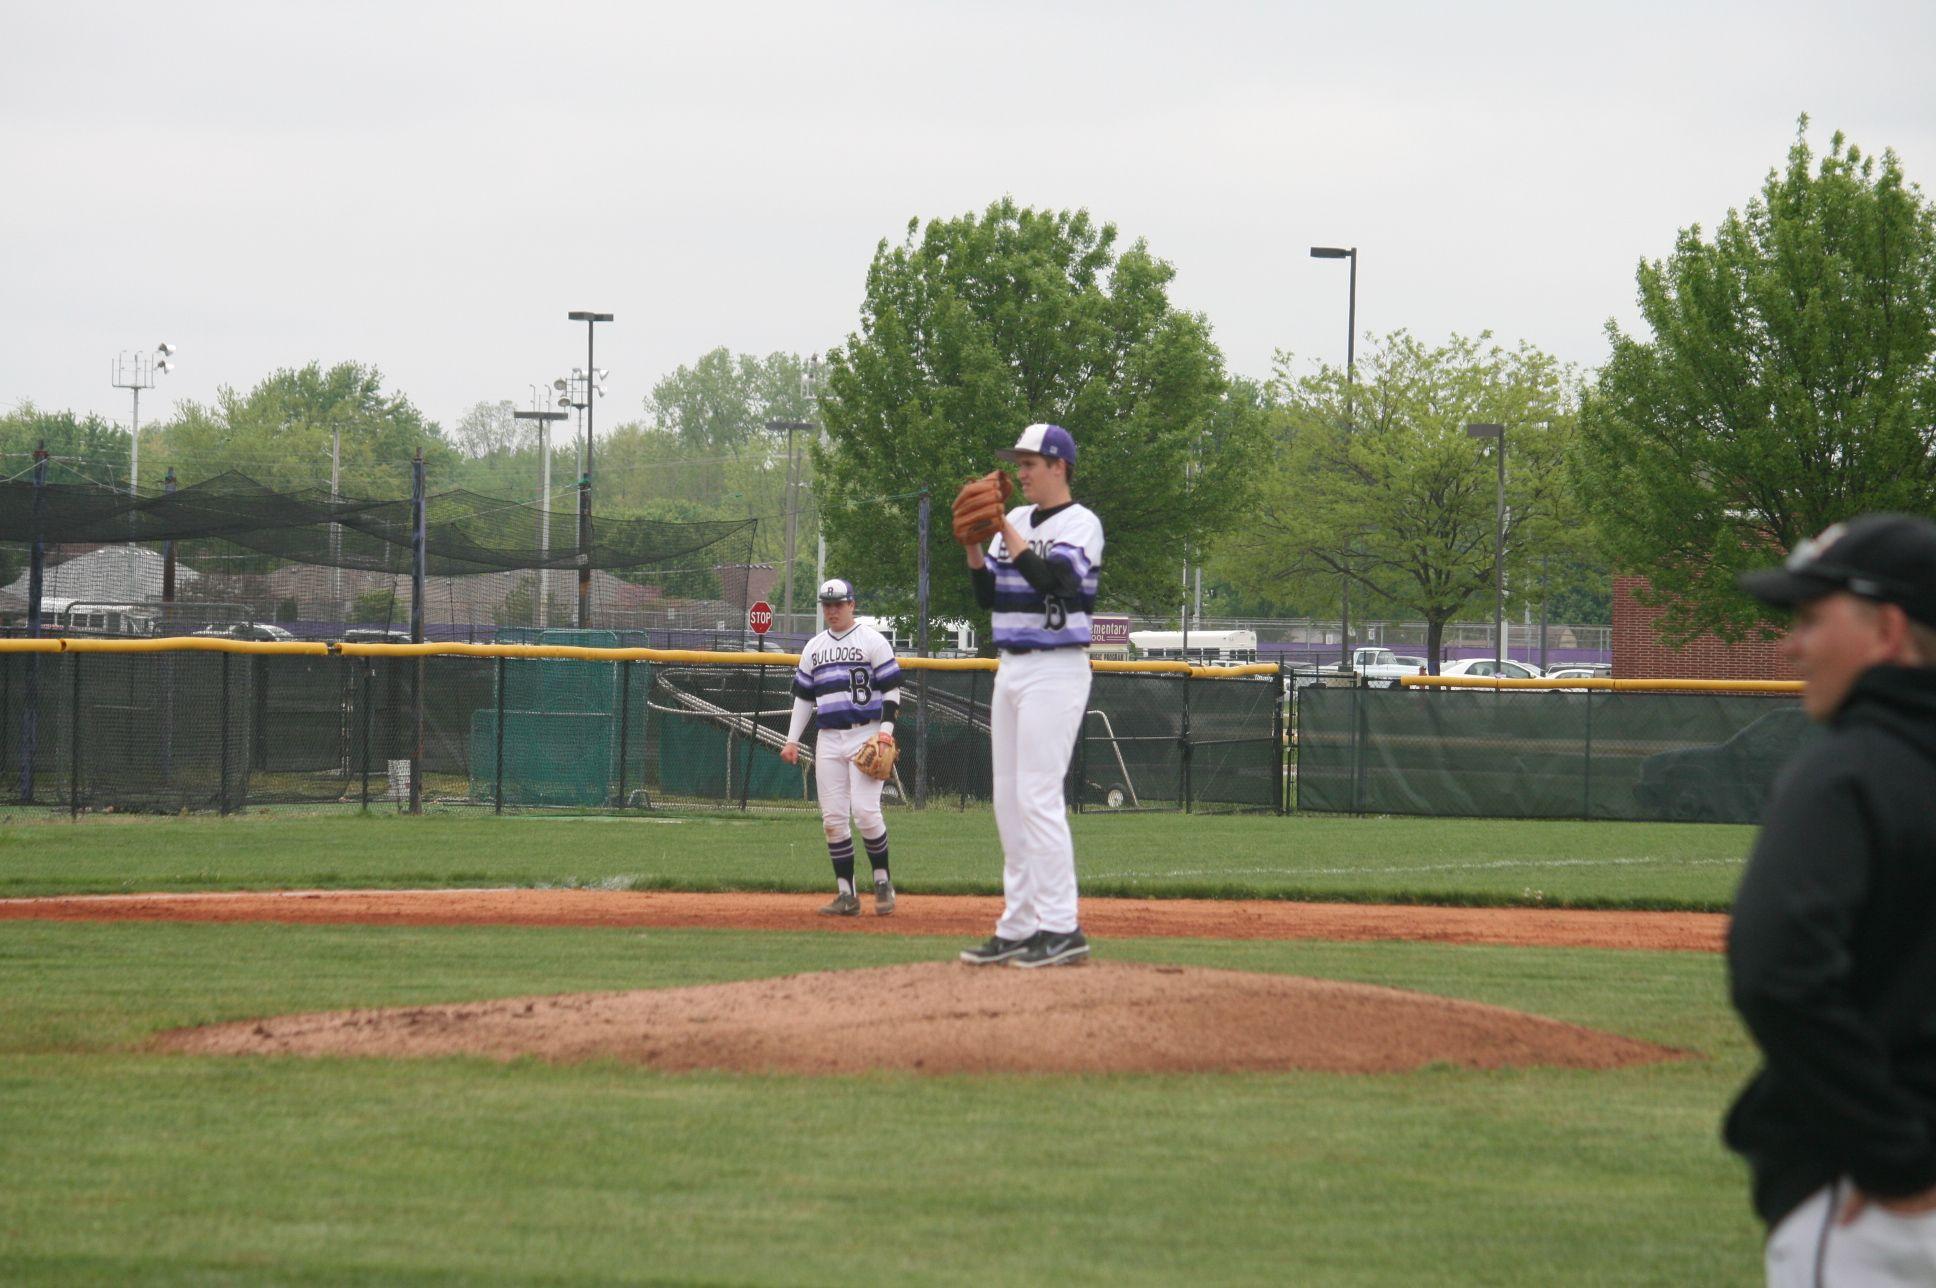 Slick Hs Baseball Purple Sunrise Unis Baseball Field Sports Uniforms Baseball